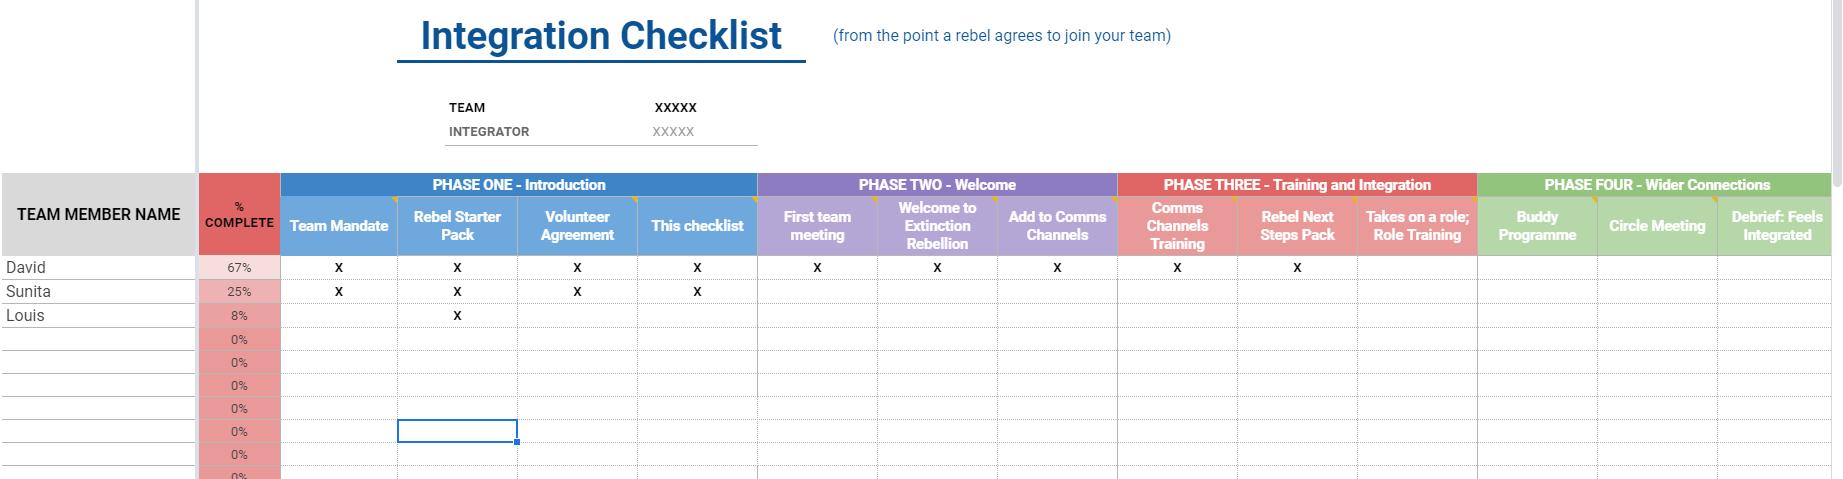 integrator-checklist.PNG